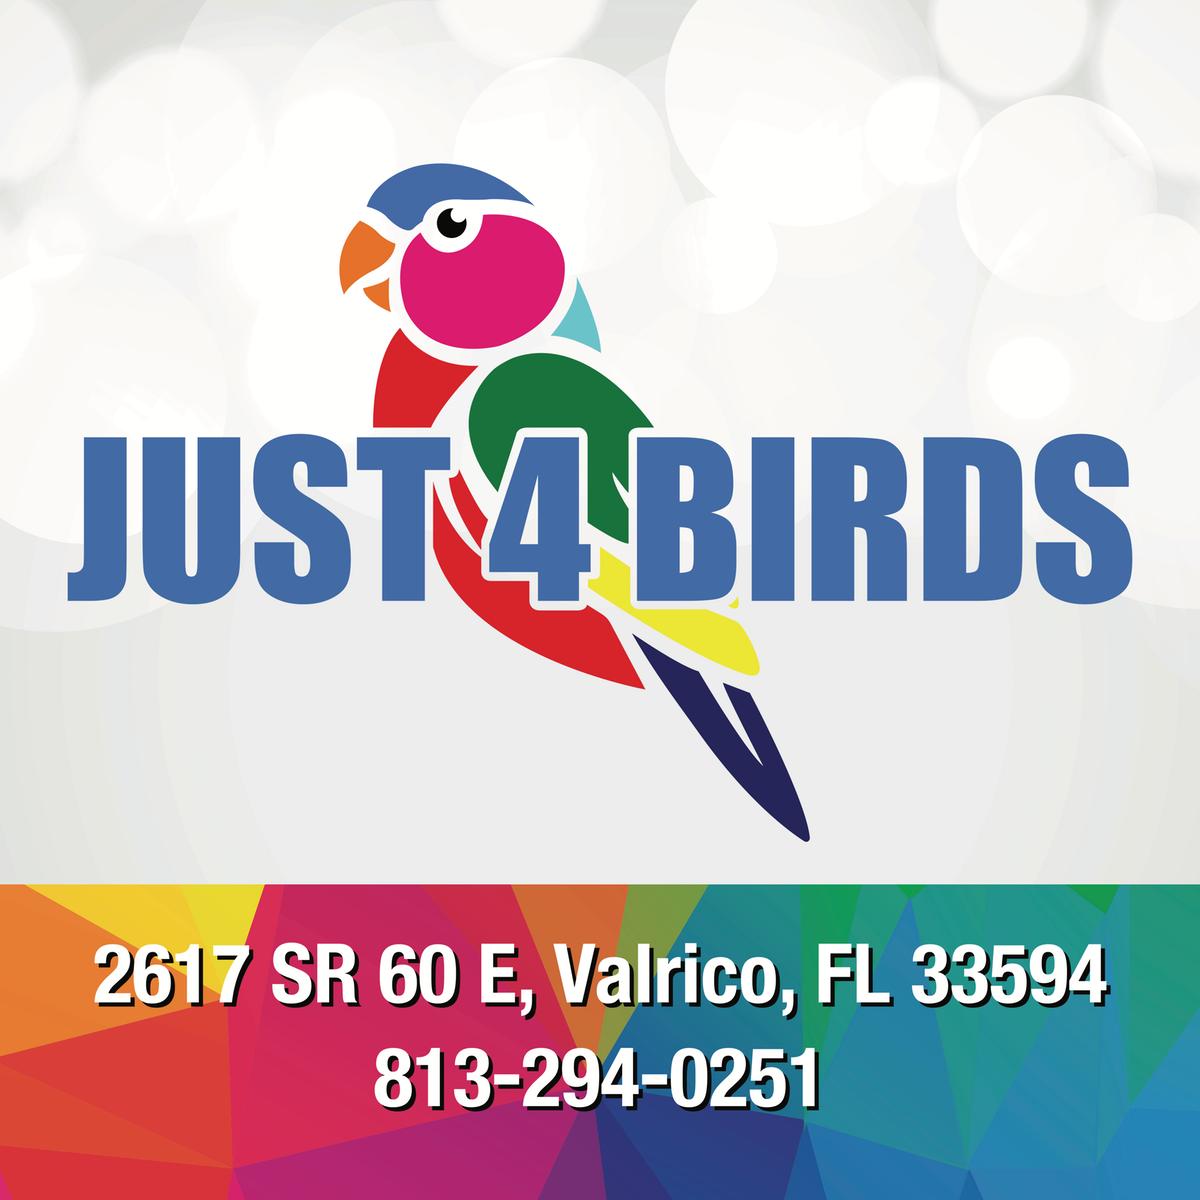 Just4Birds